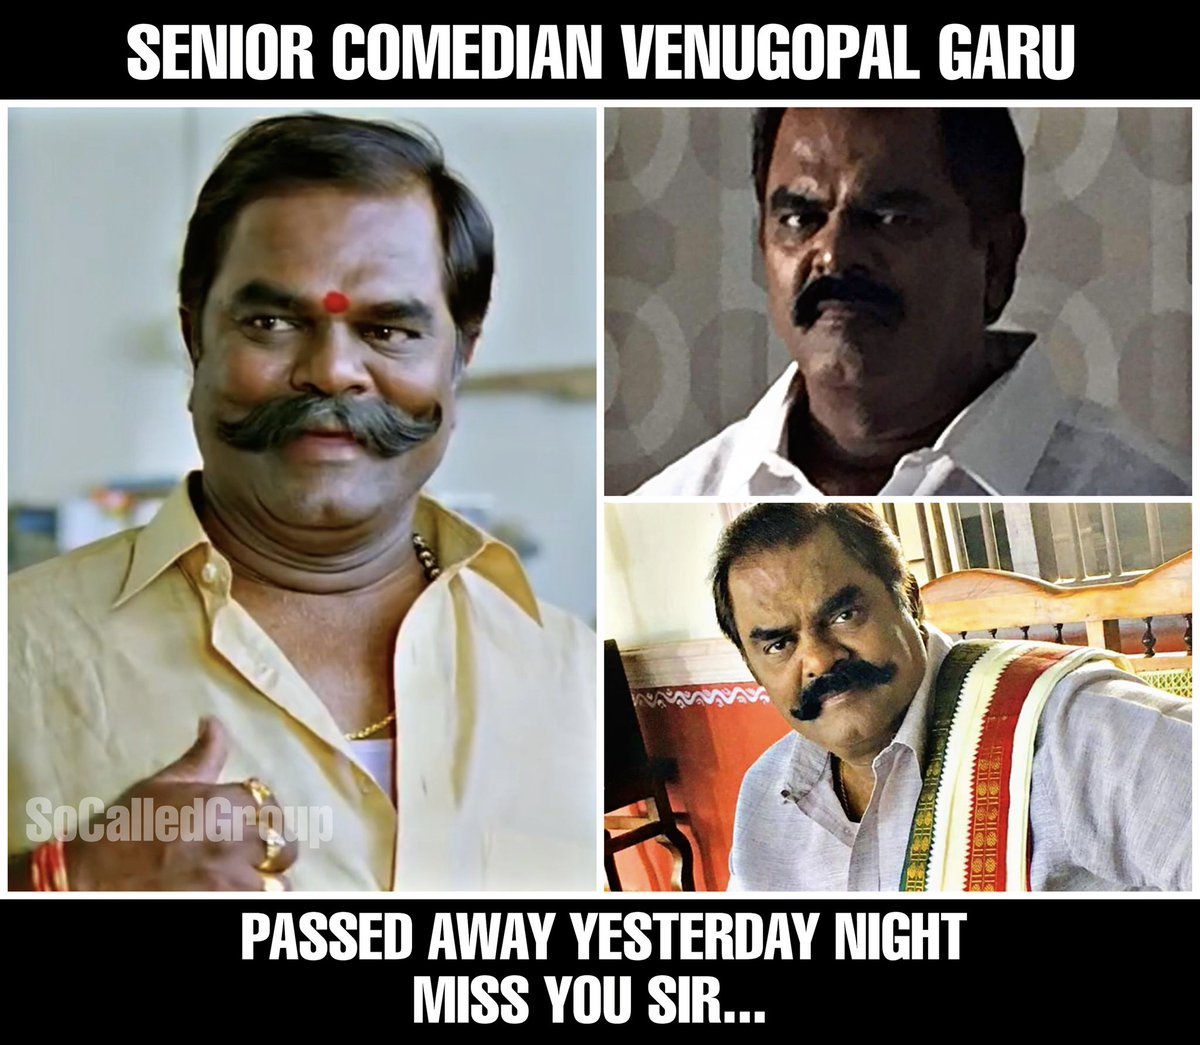 Miss you sir..!! Rip #Venugopal garu https://t.co/eVwx8RDL2J